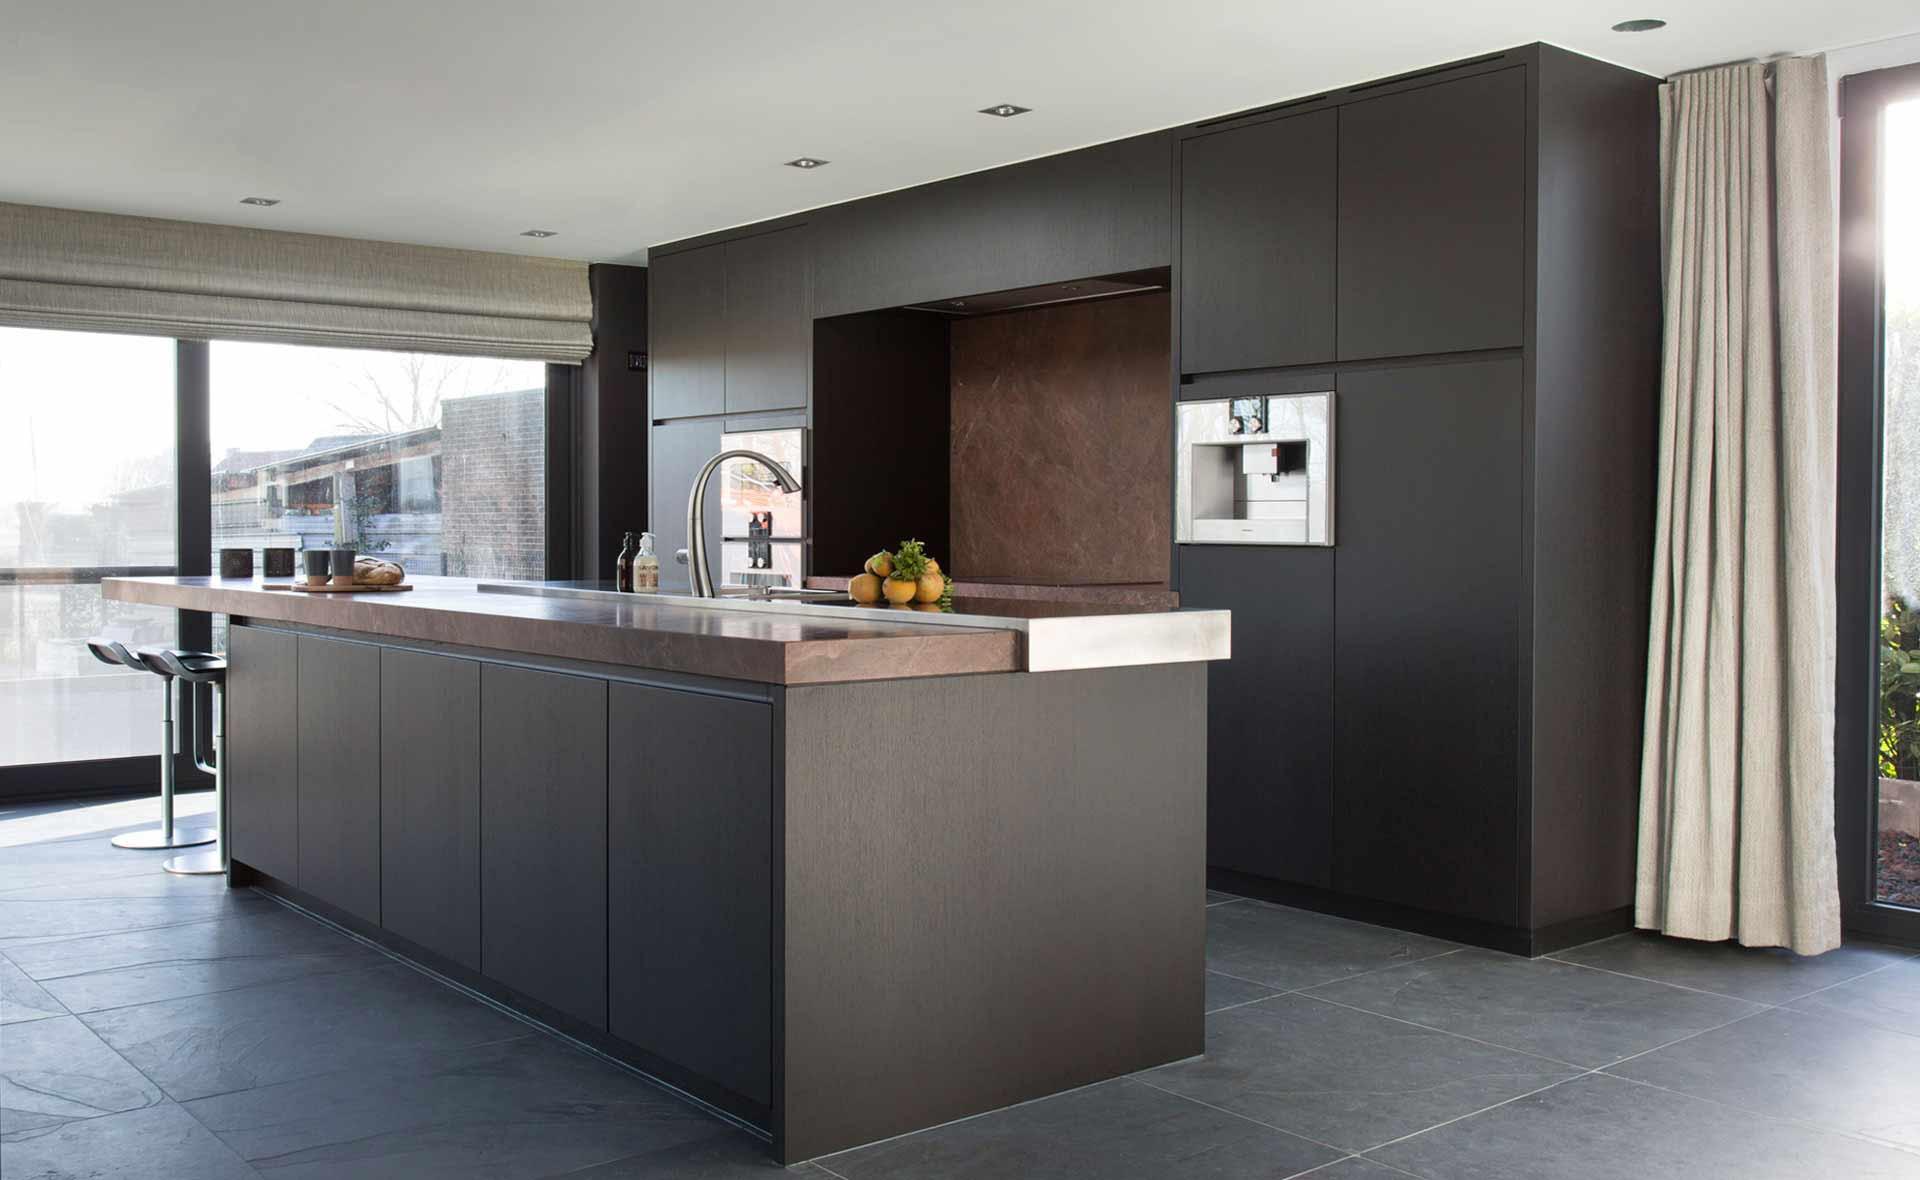 Dekeyzer-hedendaagse-keuken-bruine-tinten-1.jpg